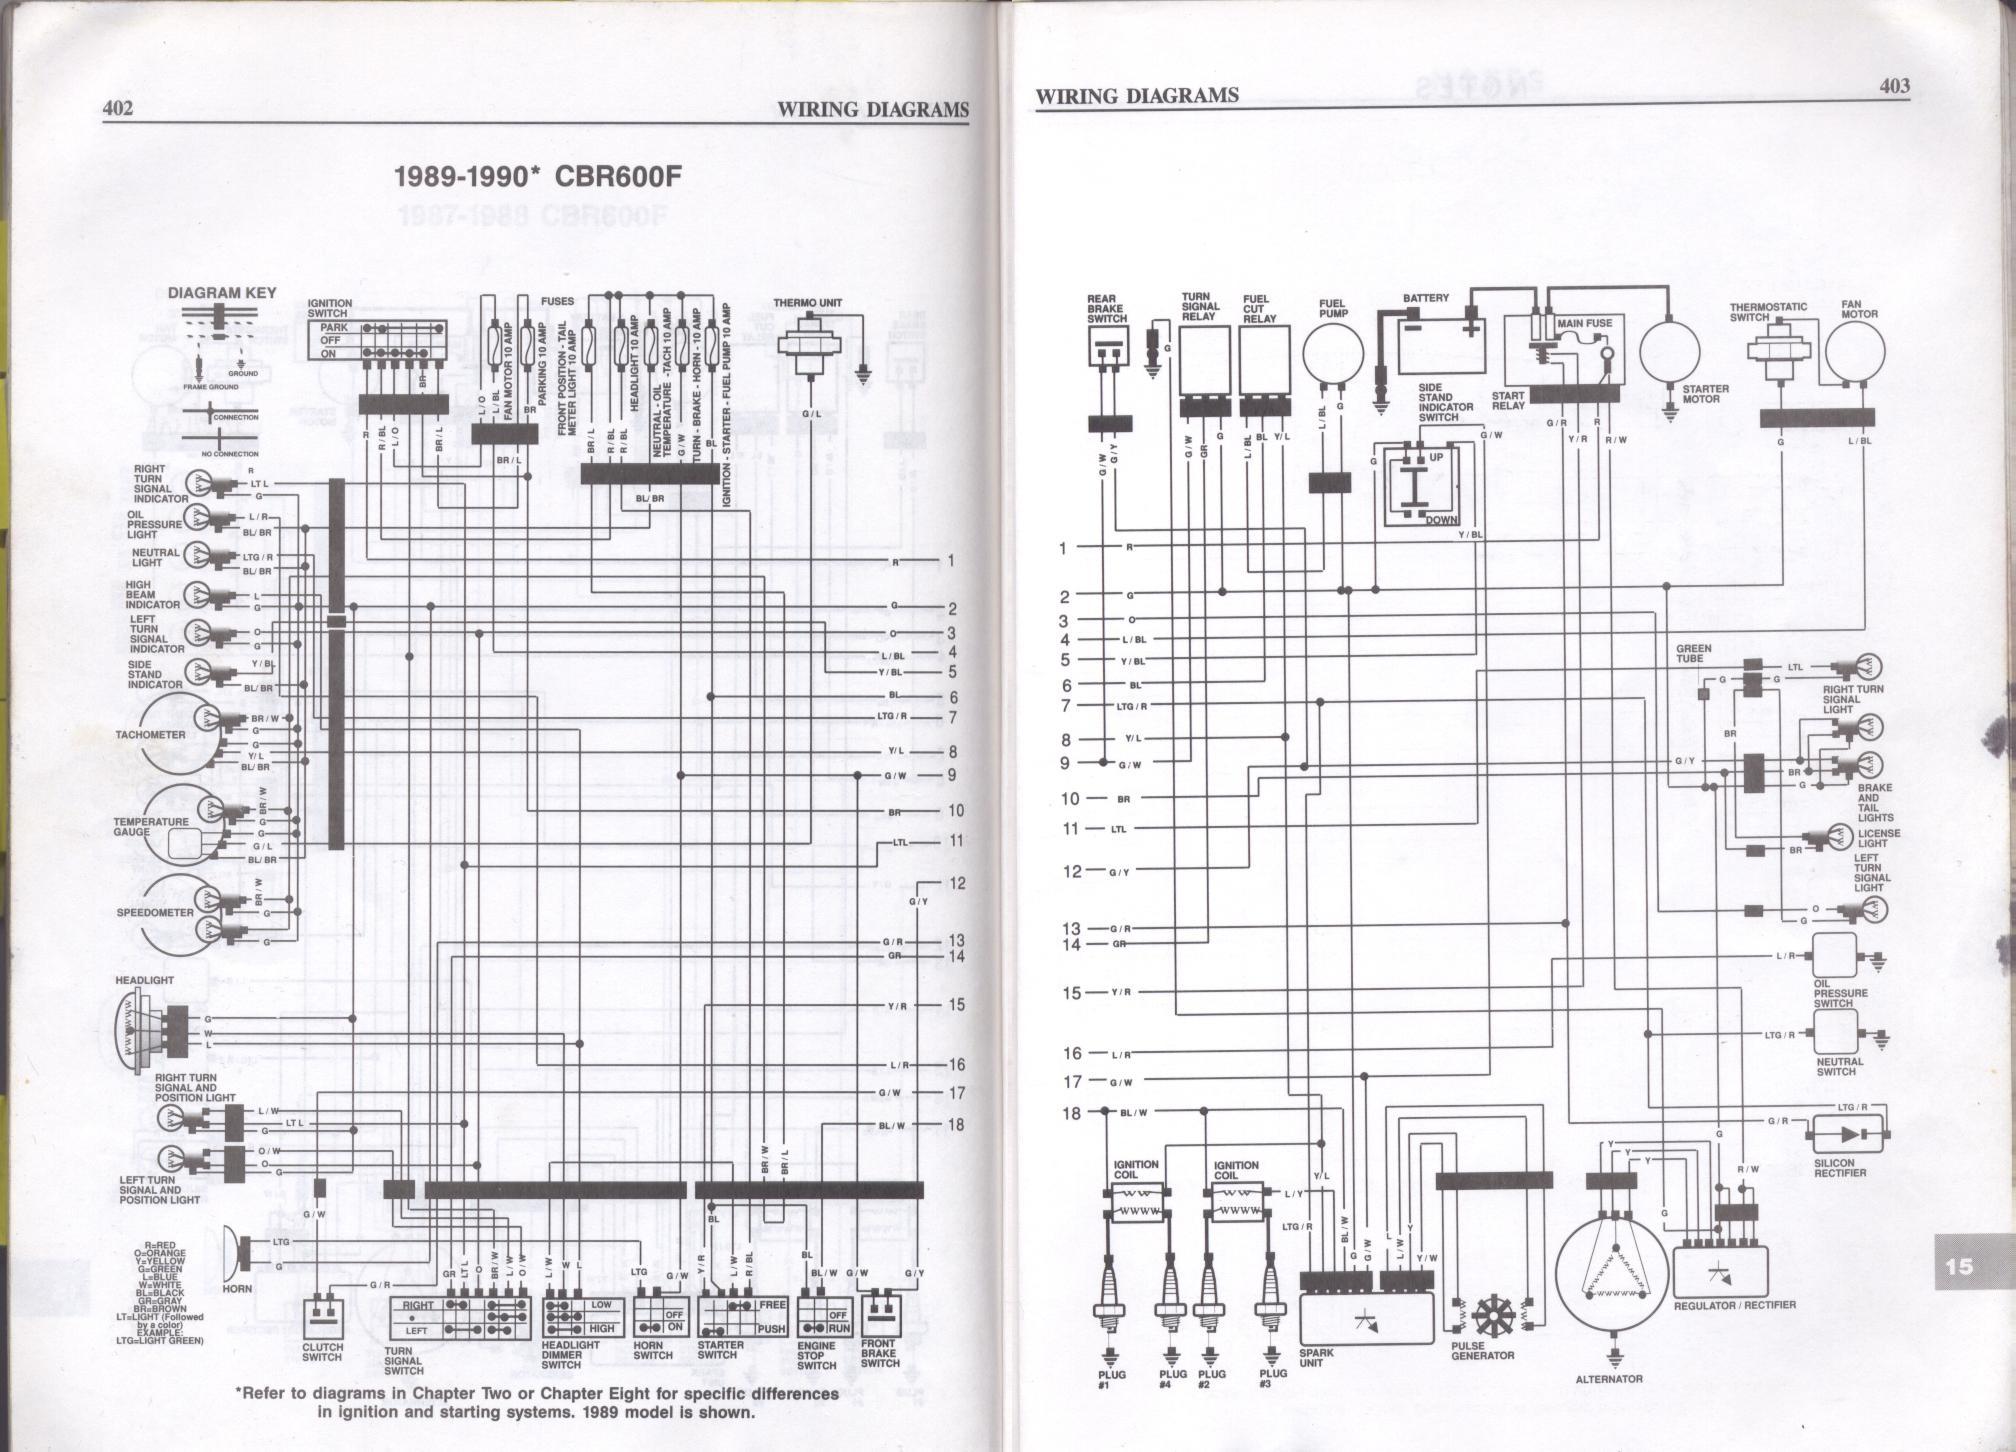 2006 honda cbr600rr wiring diagram Collection-2006 honda cbr600rr wiring diagram 10-t